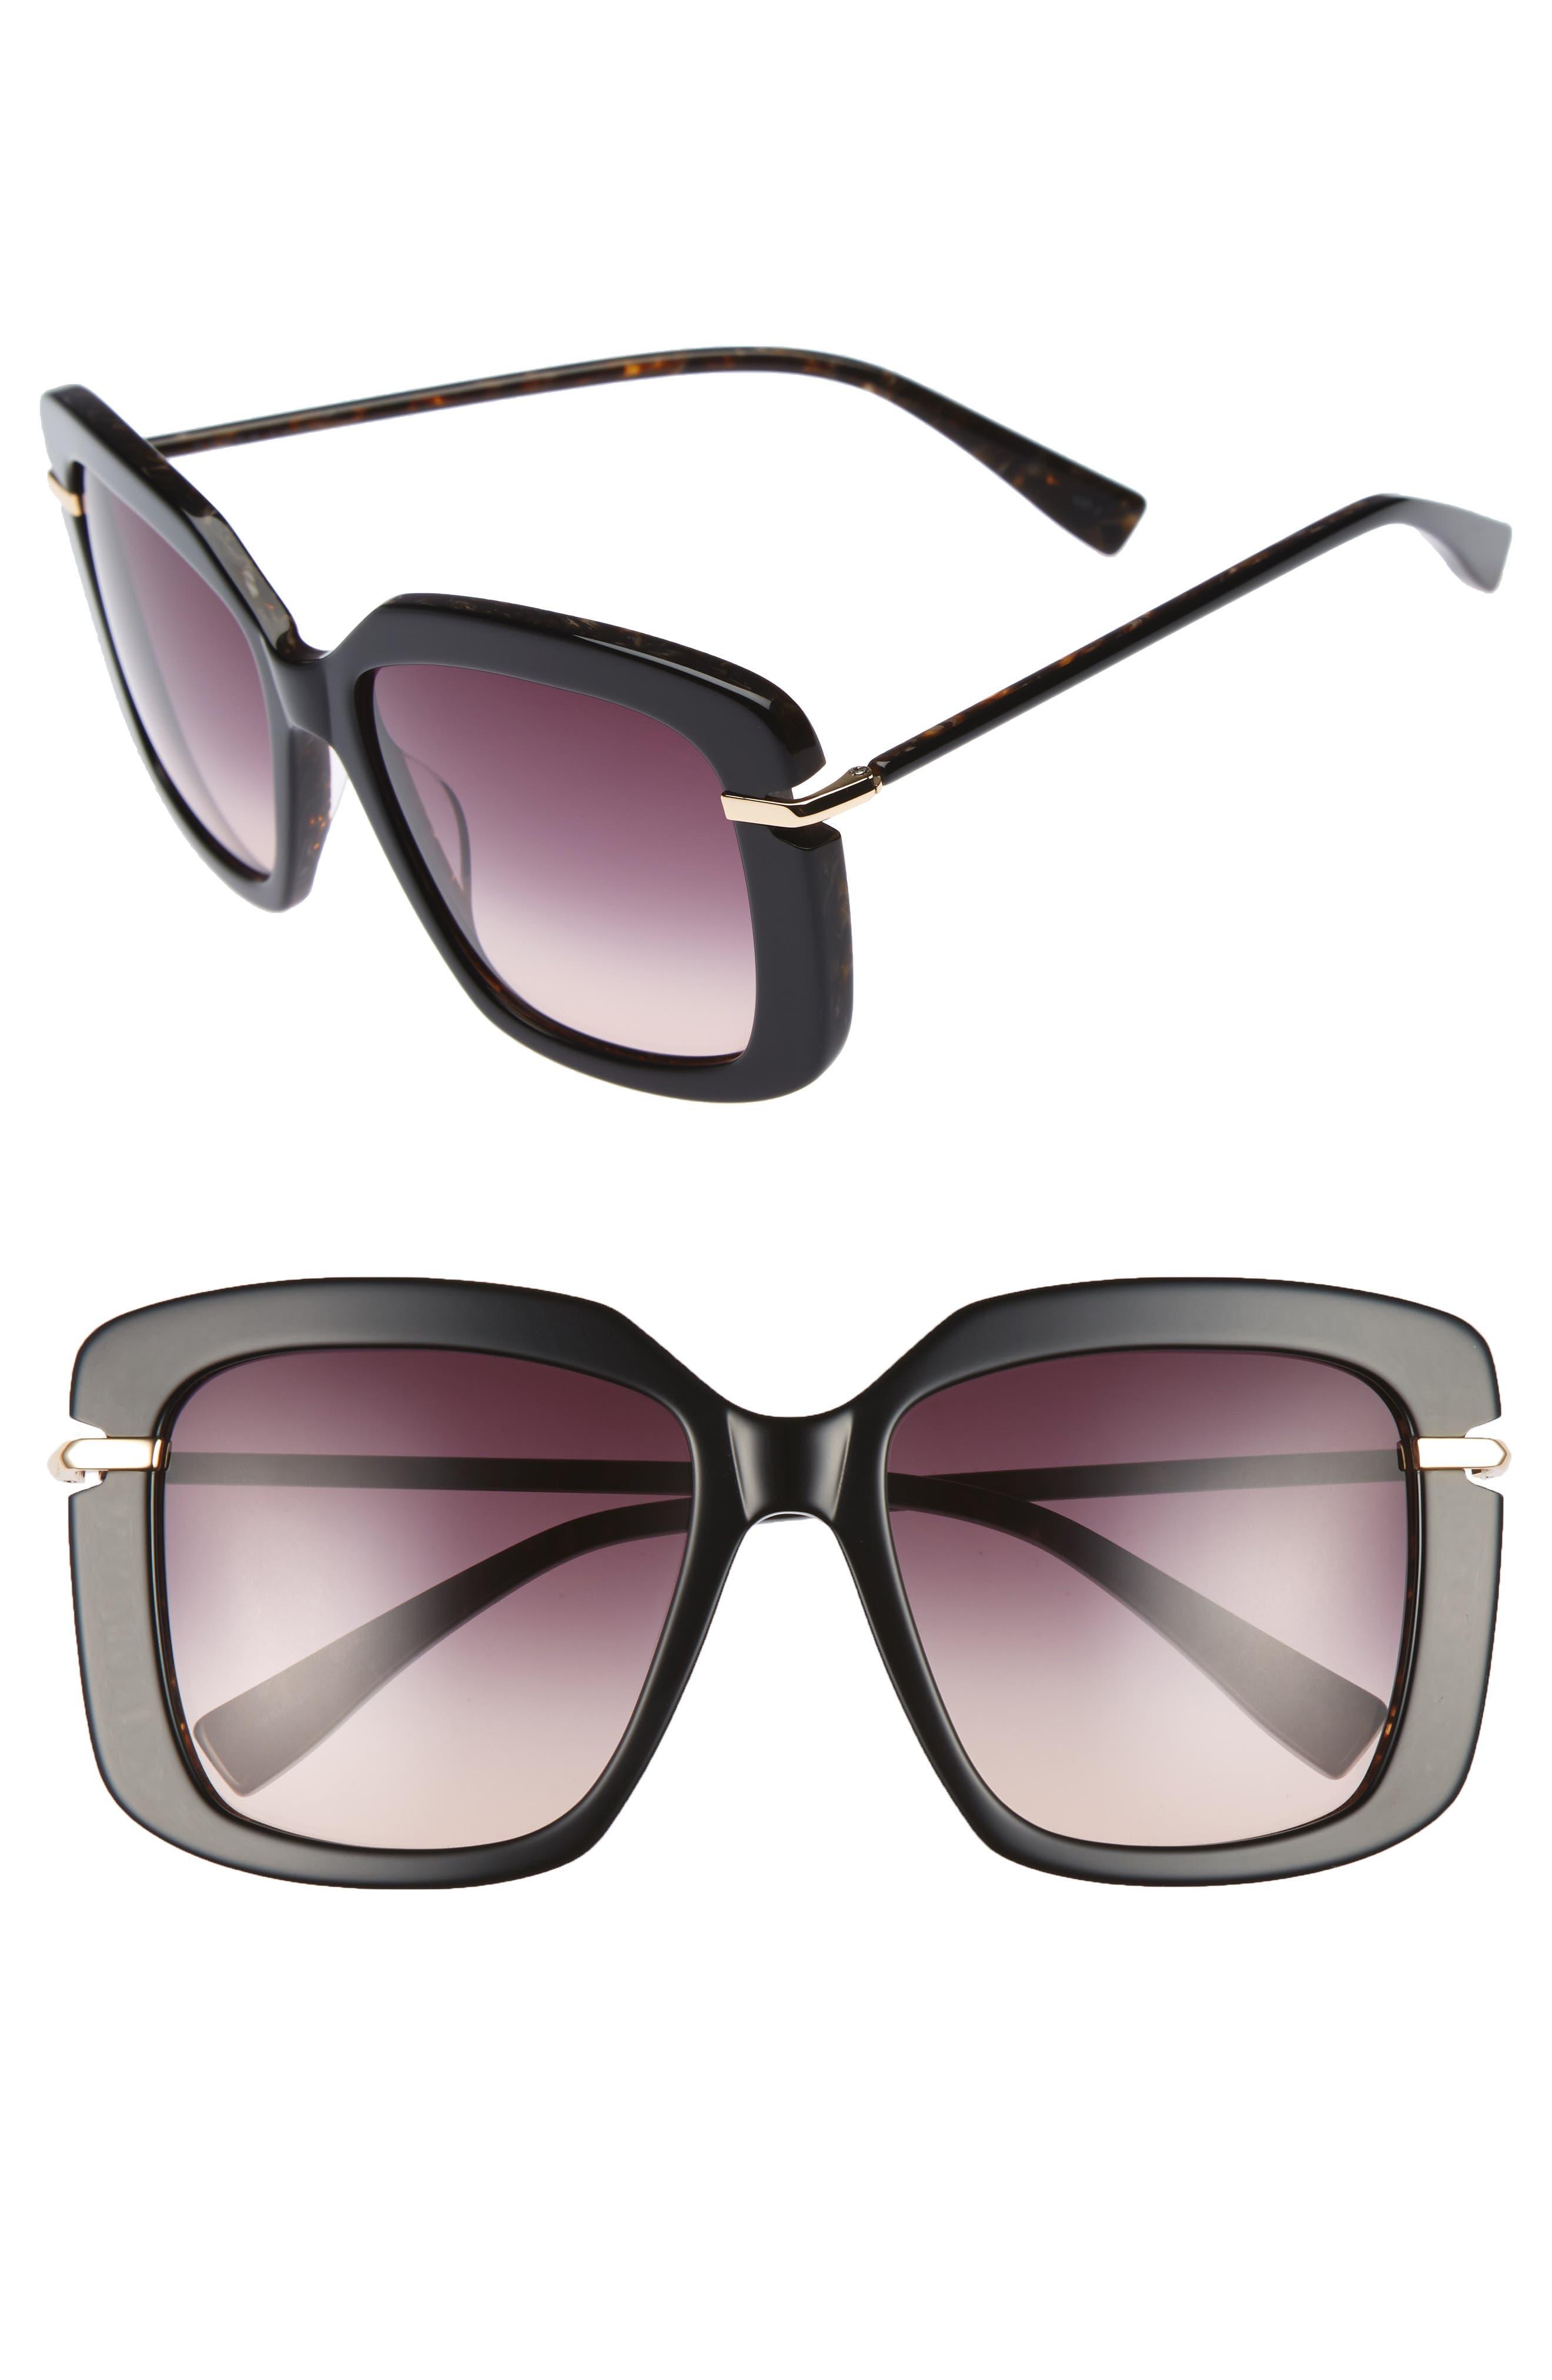 Anita 55mm Square Sunglasses,                             Main thumbnail 1, color,                             Black Brown